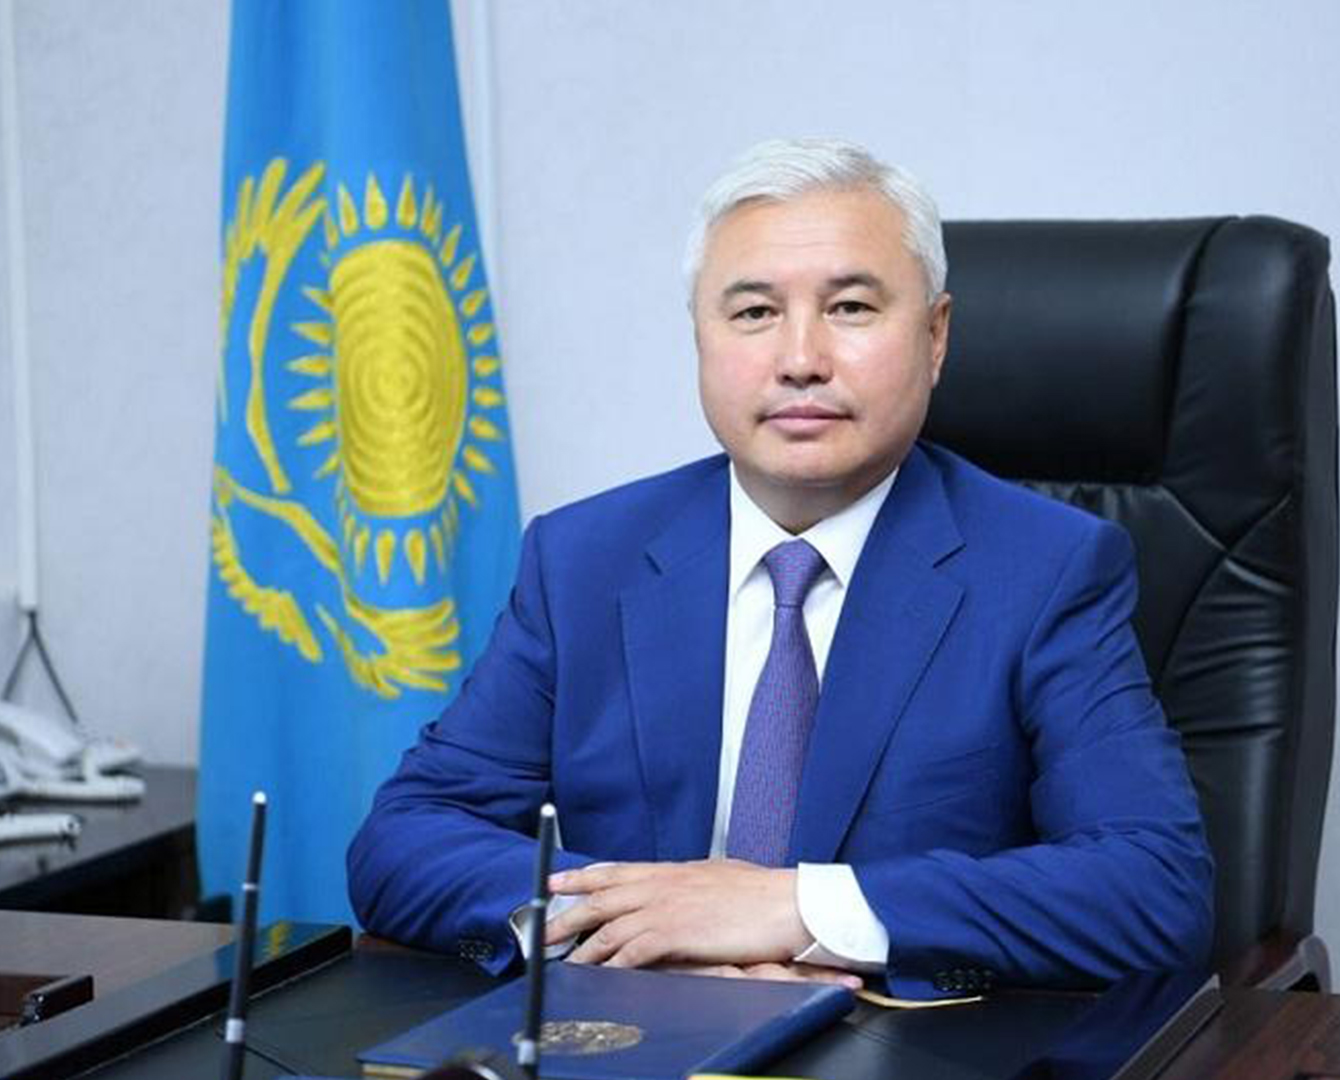 Аким Экибастуза переведён первым замакима Туркестанской области